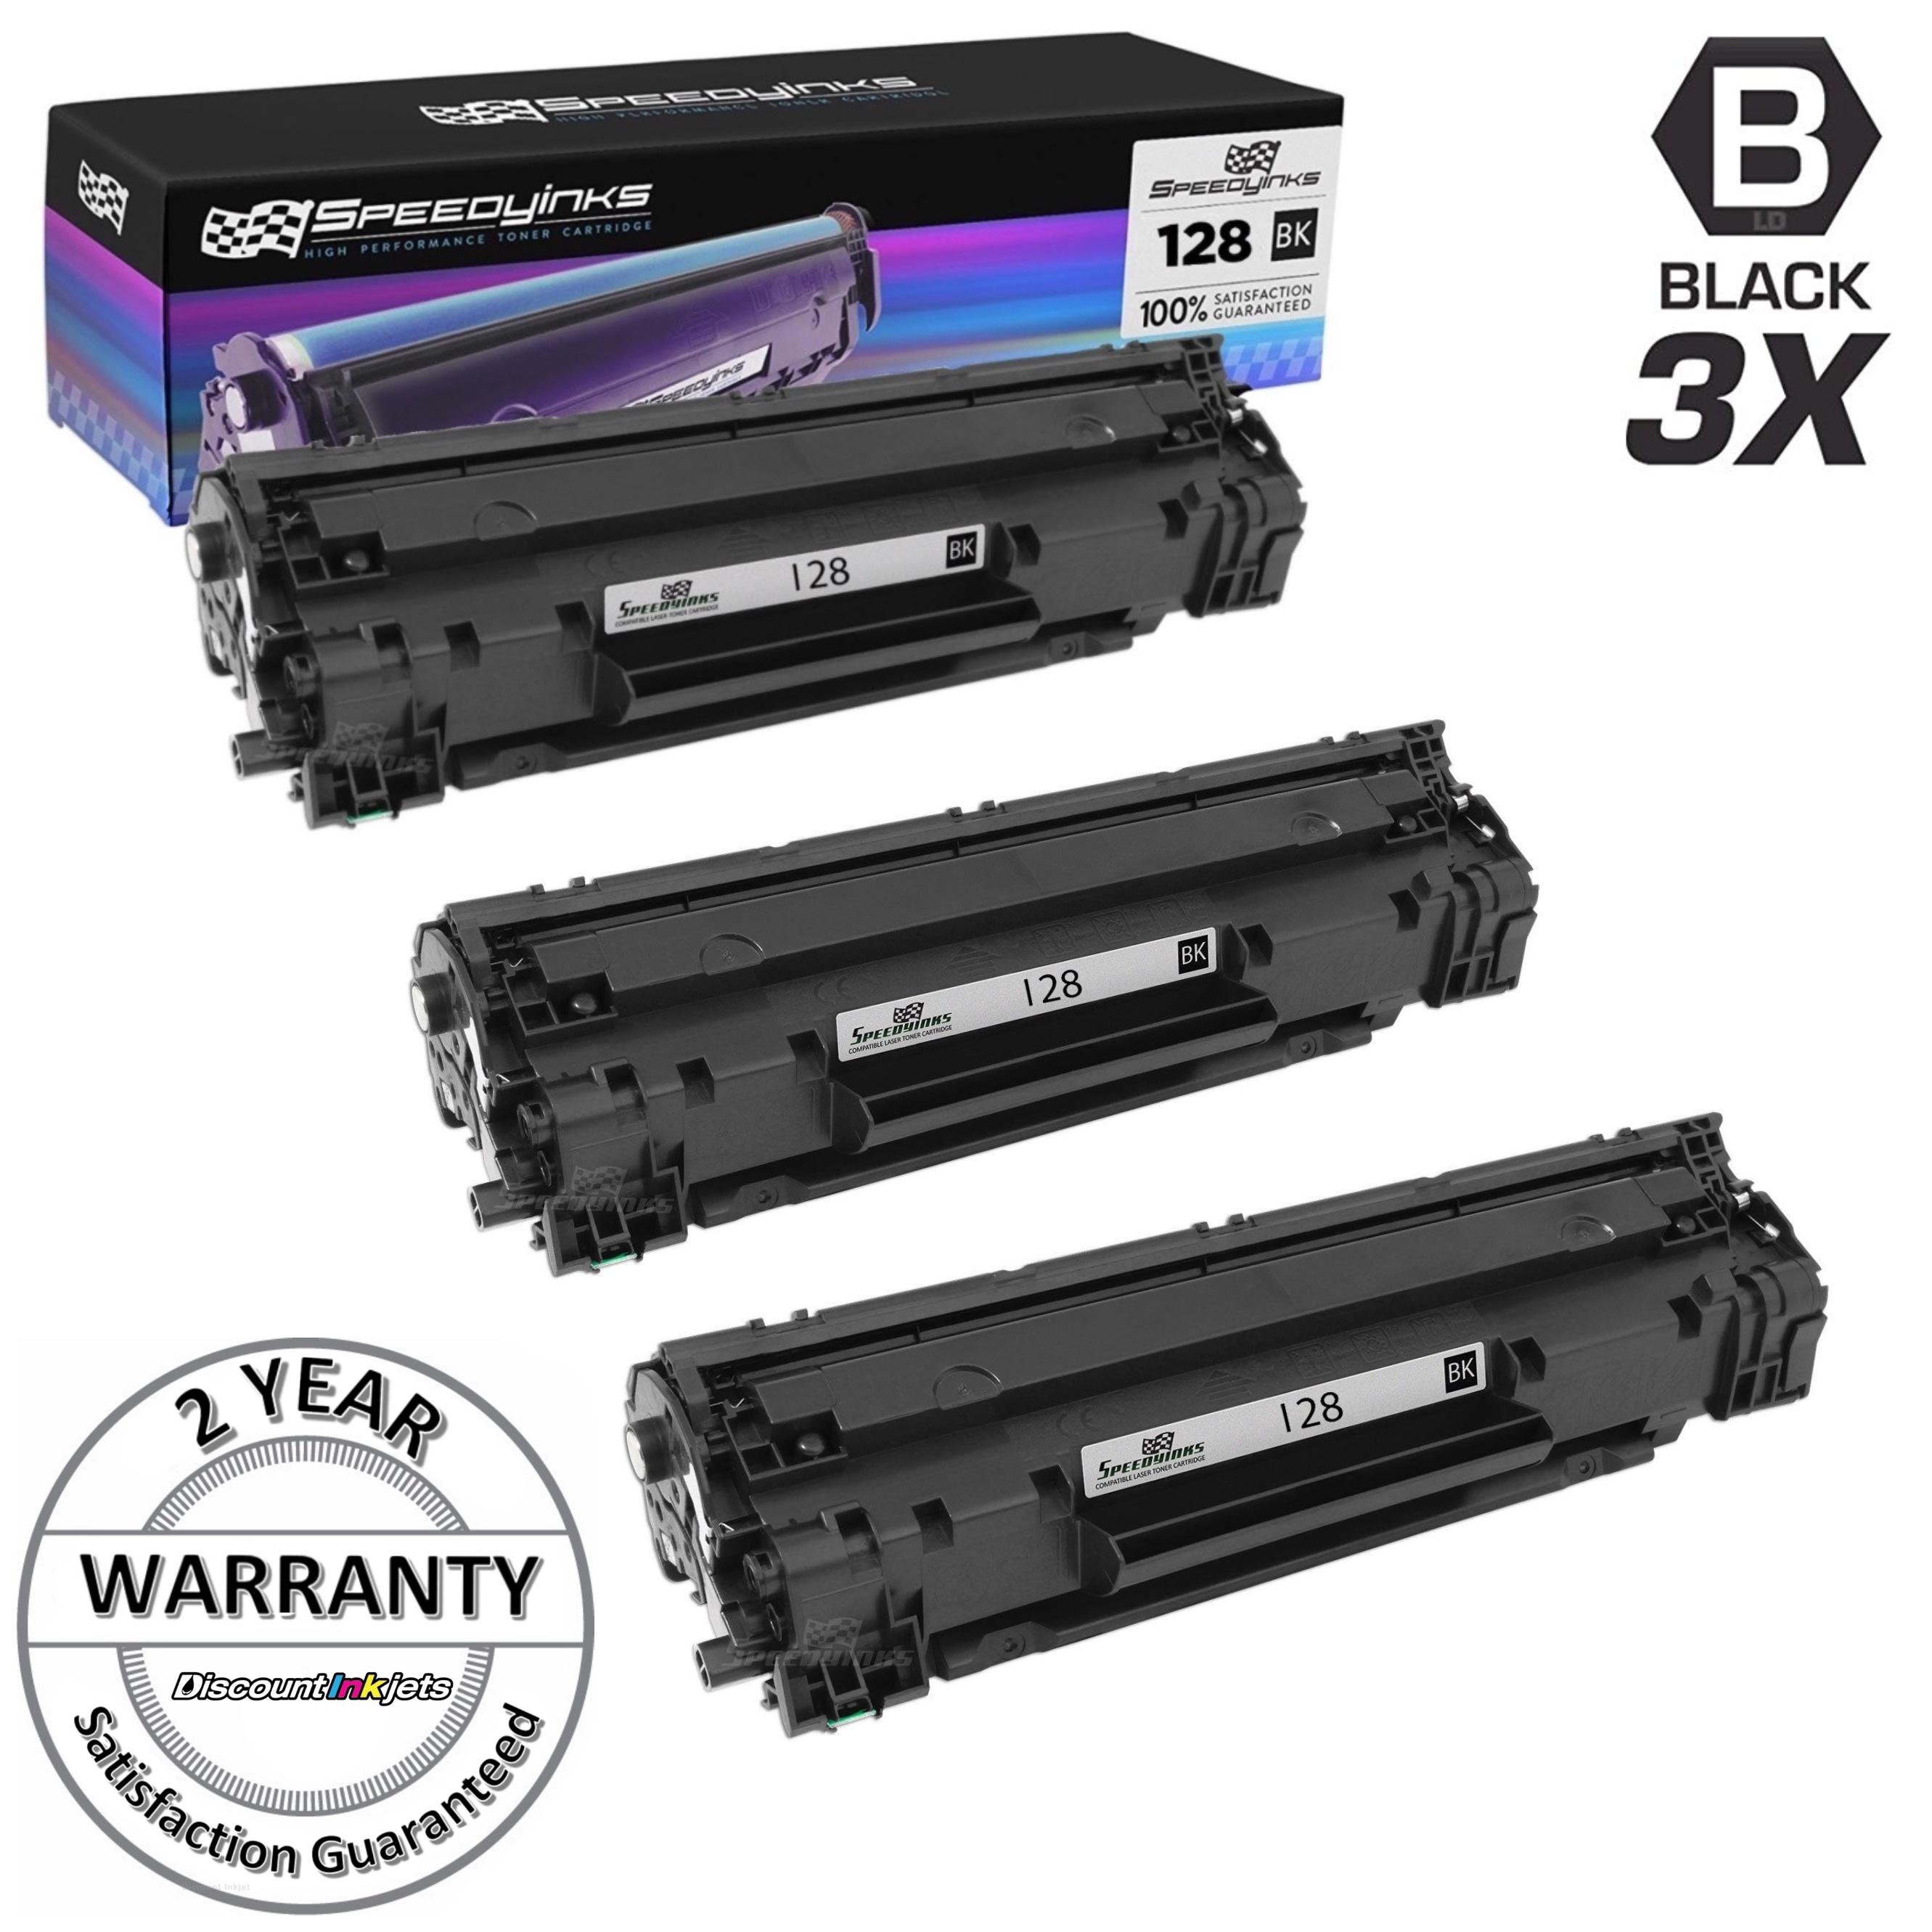 6 PK Black Laser Toner Cartridge For Canon 128 ImageClass MF4890dw MF4570DN D530